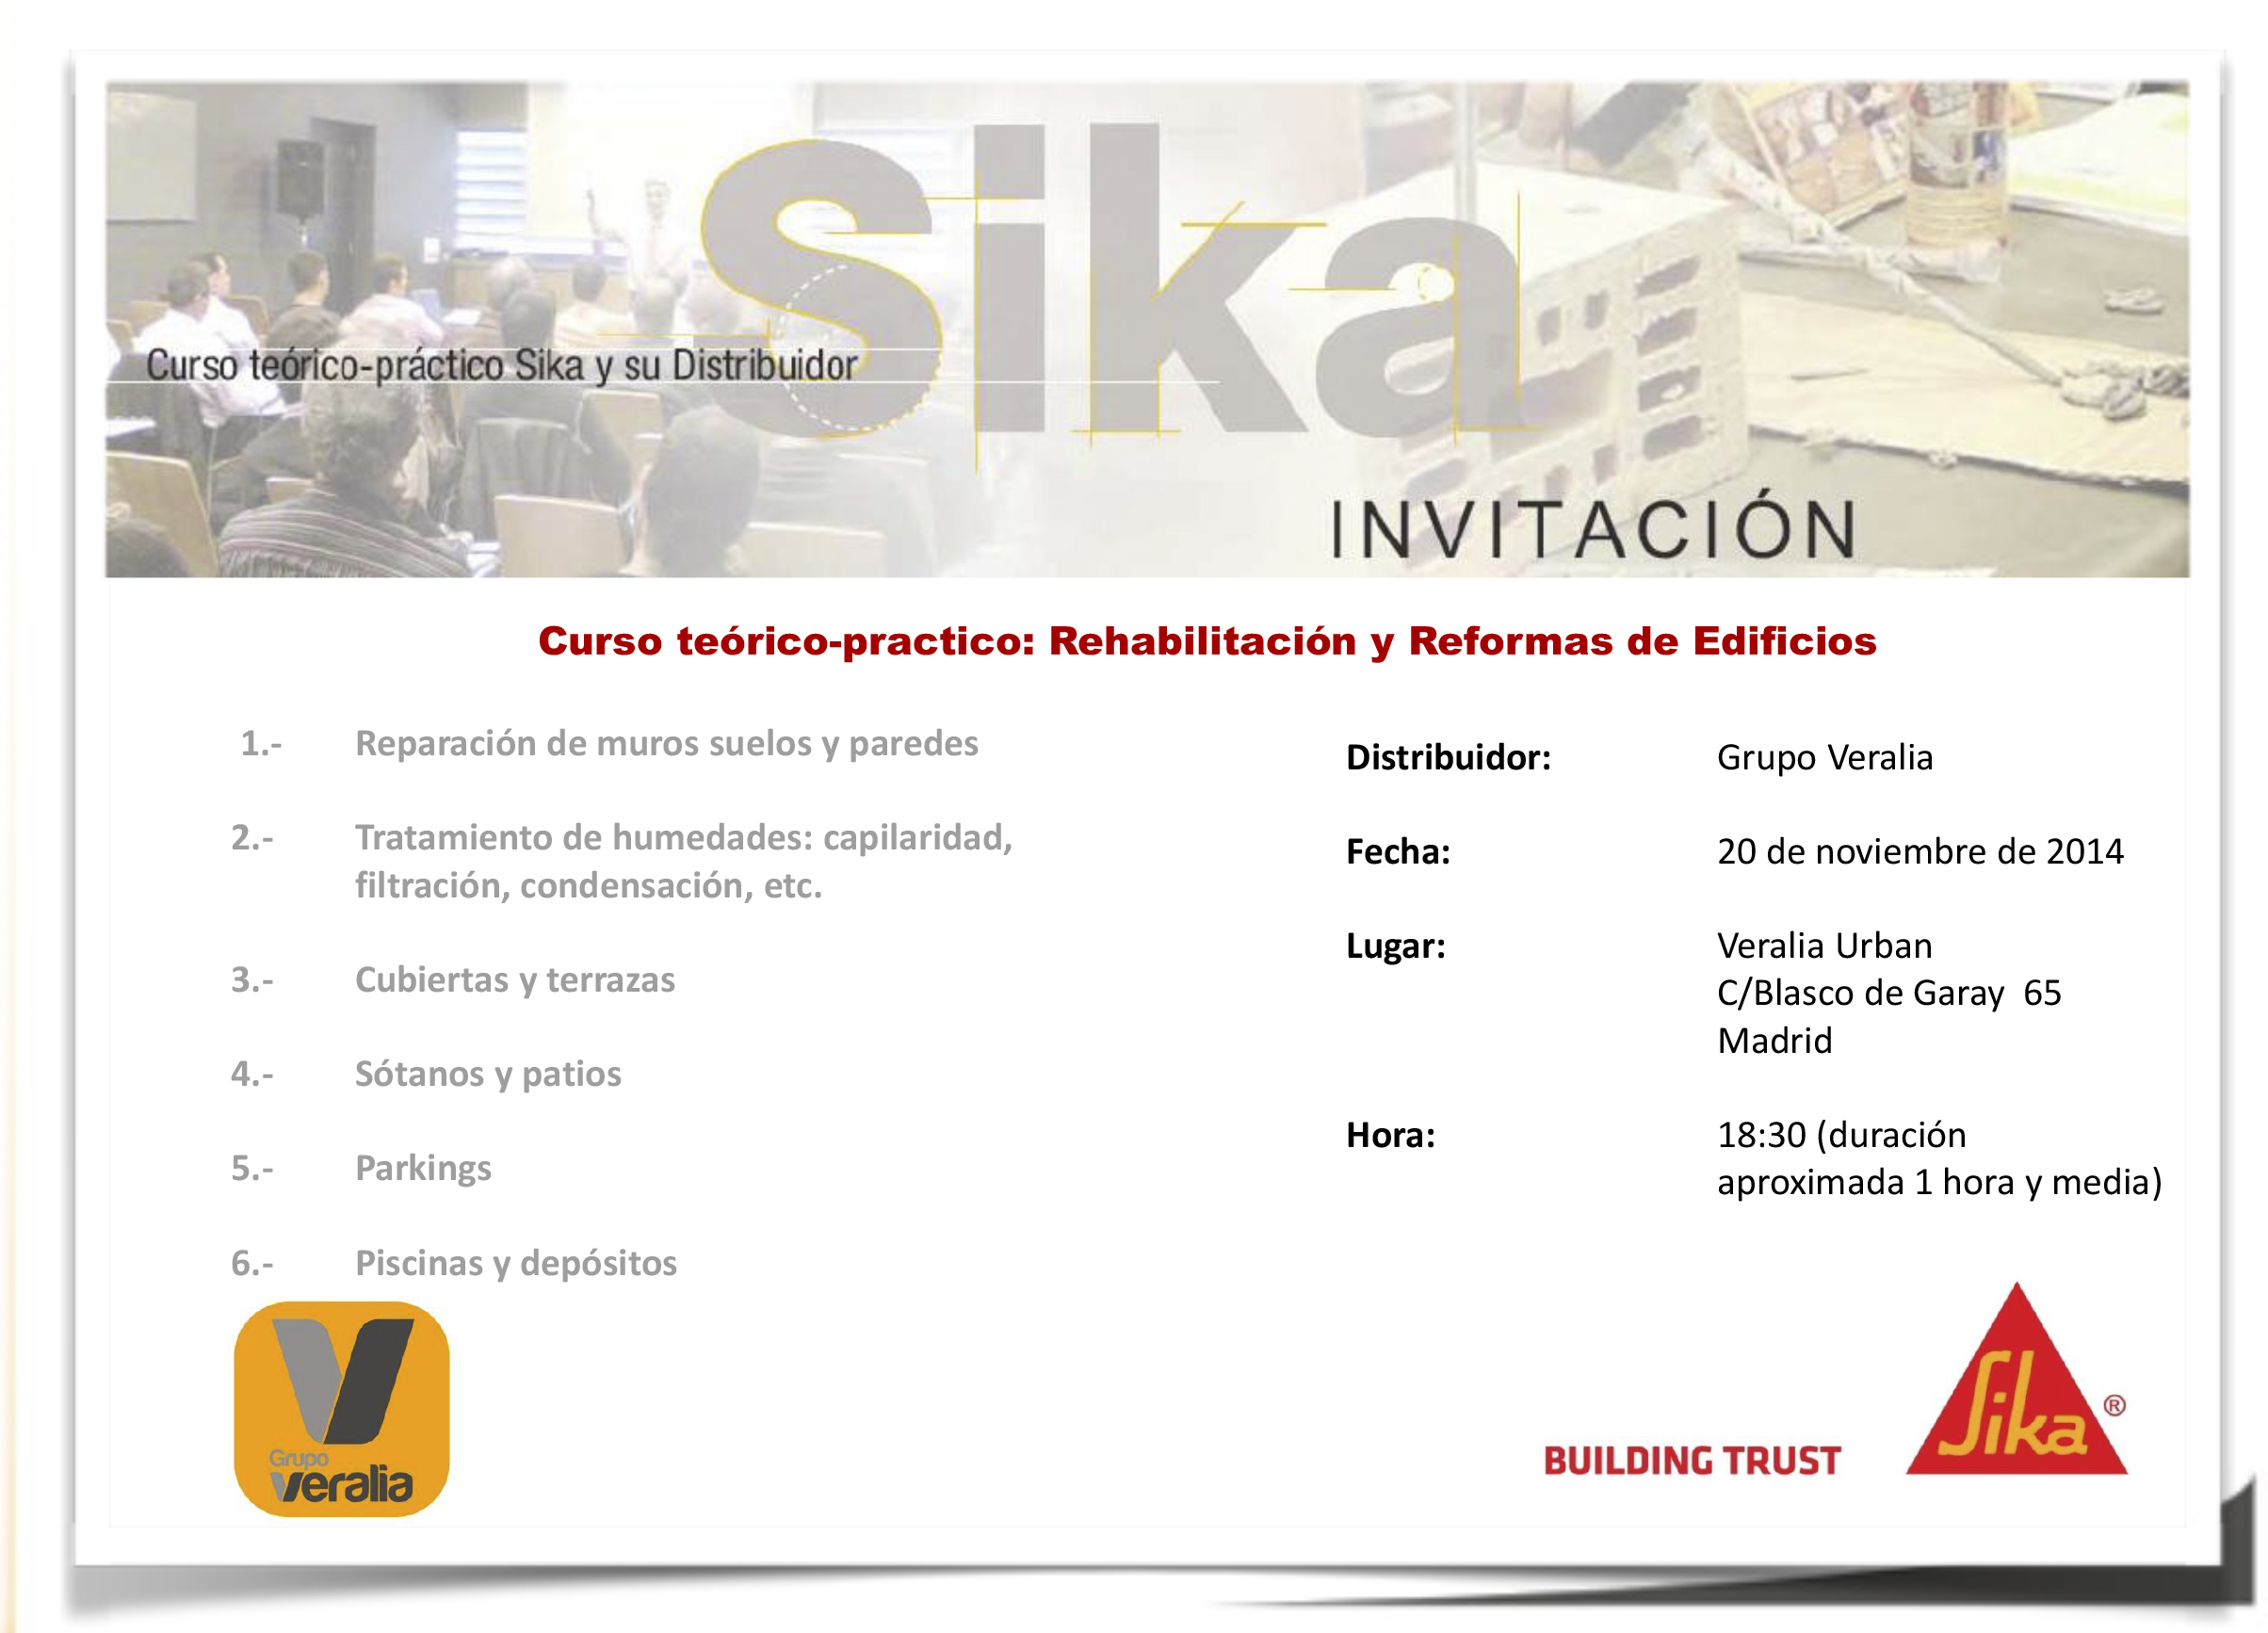 folleto mailing